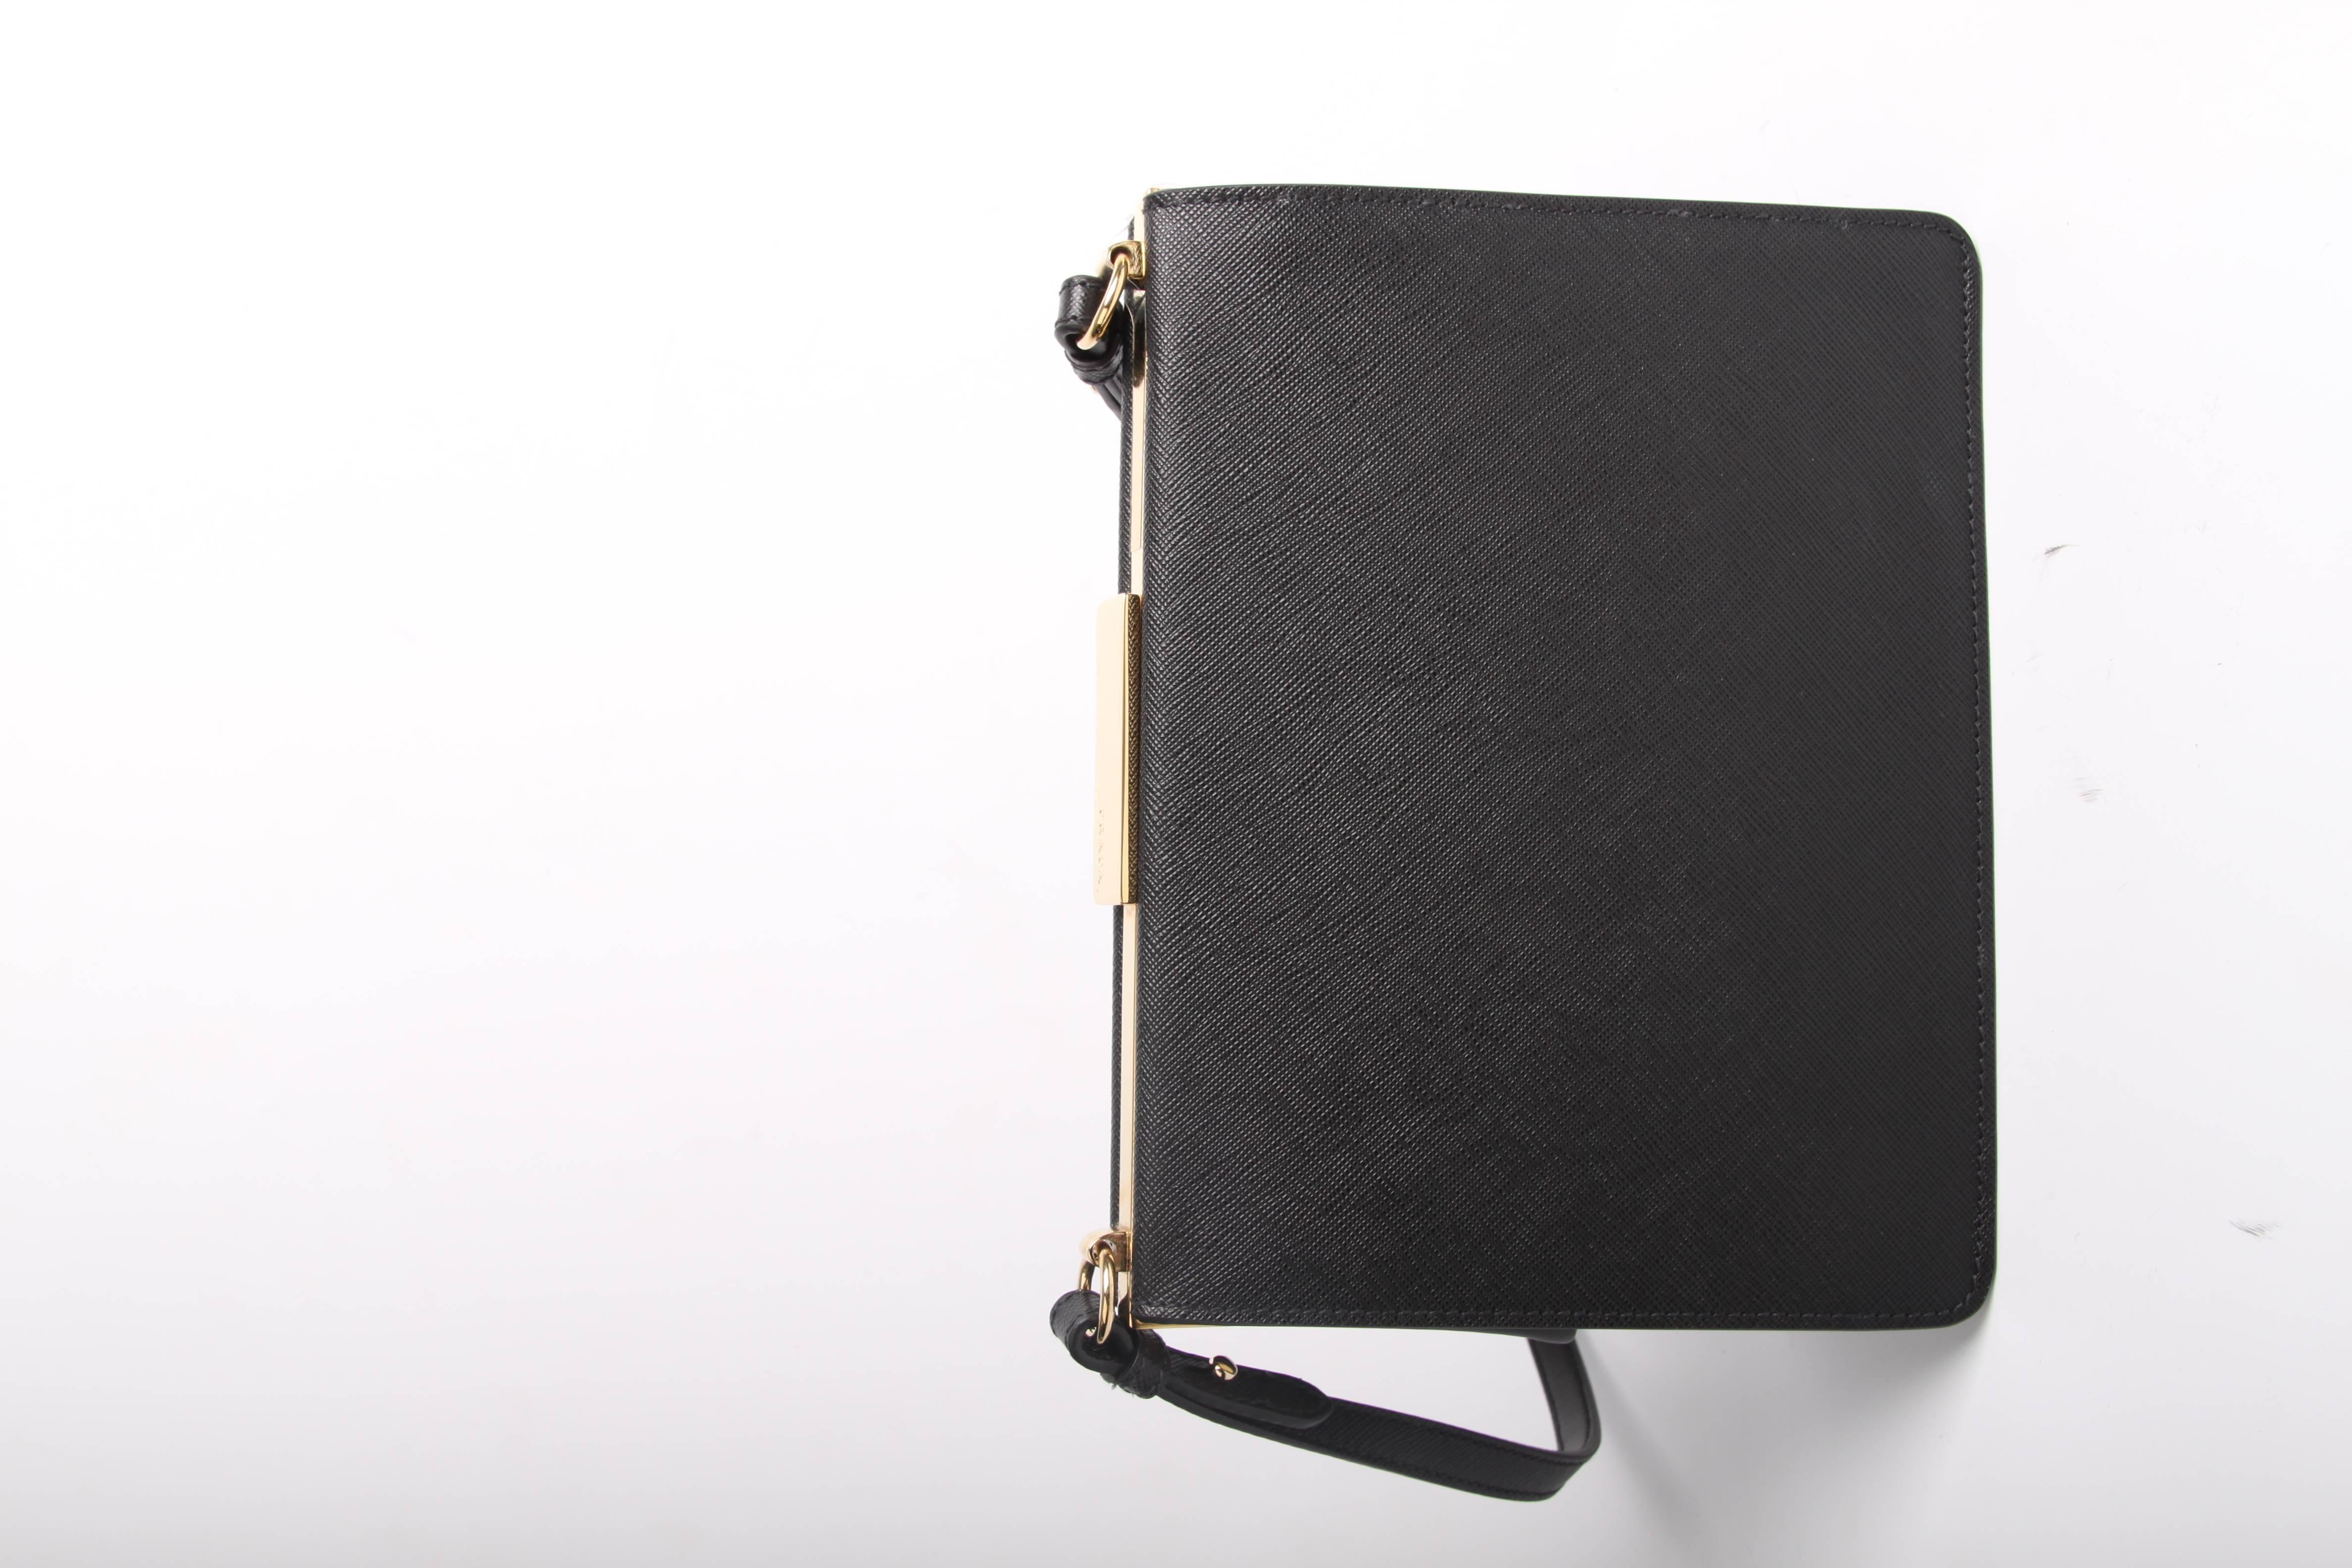 6c5a1ab60150ca Prada Light Frame Saffiano Leather Shoulder Bag - black 2018 at 1stdibs